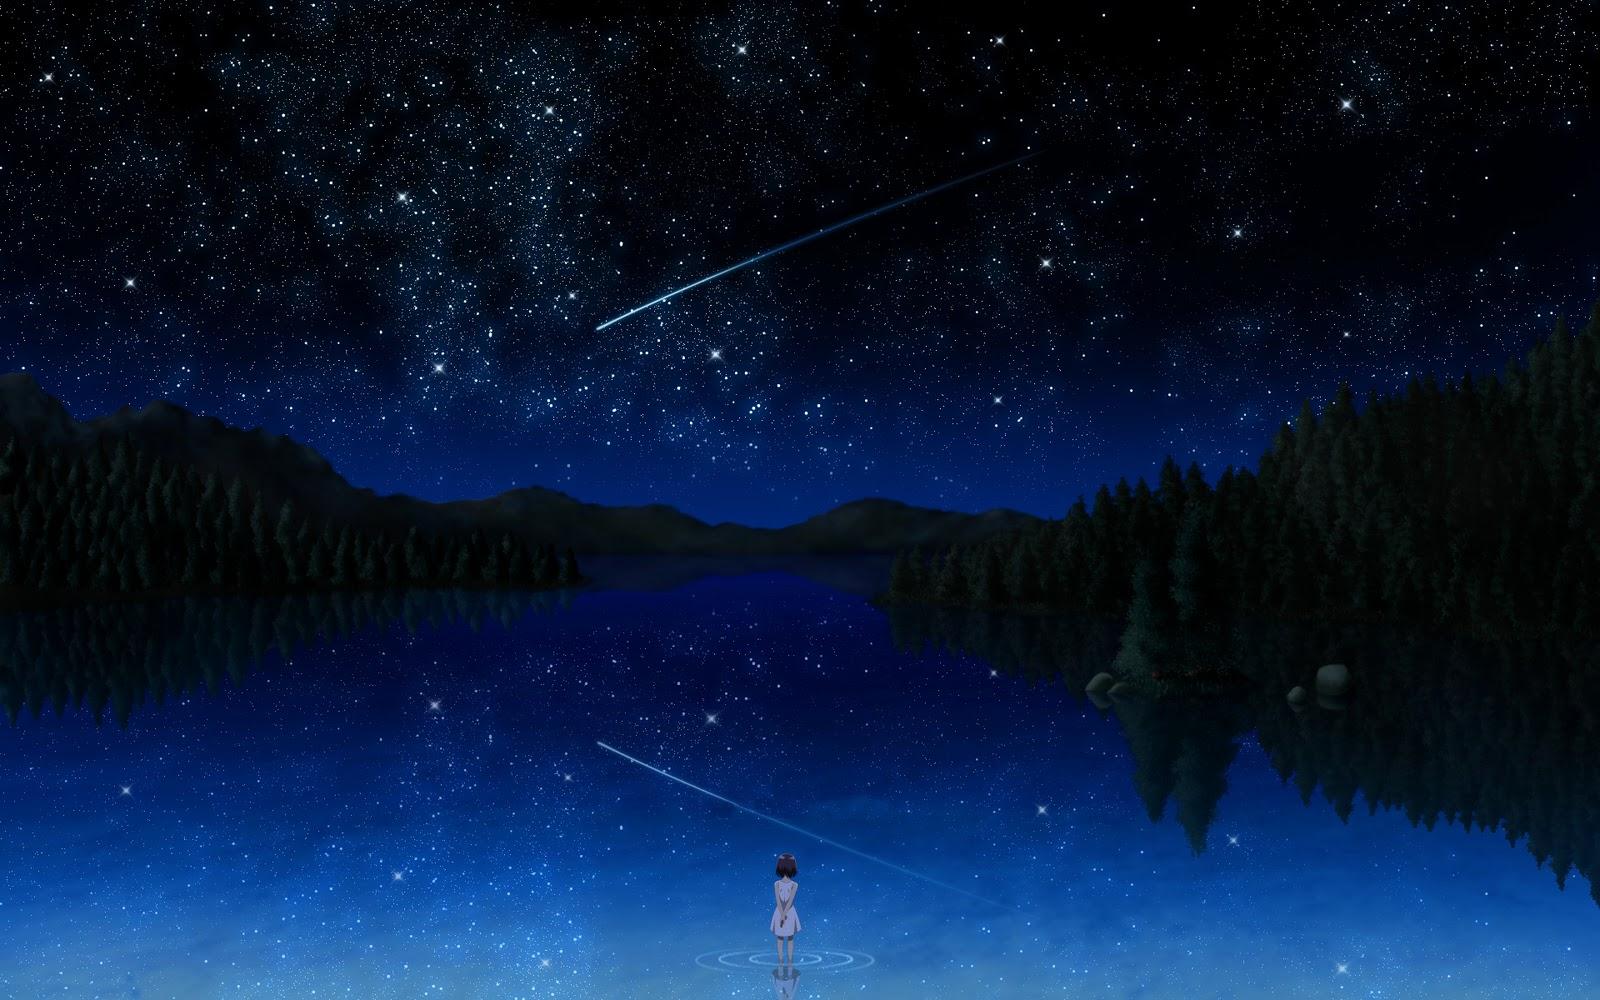 Meteor Shower Reflection - Meteor Shower Reflection